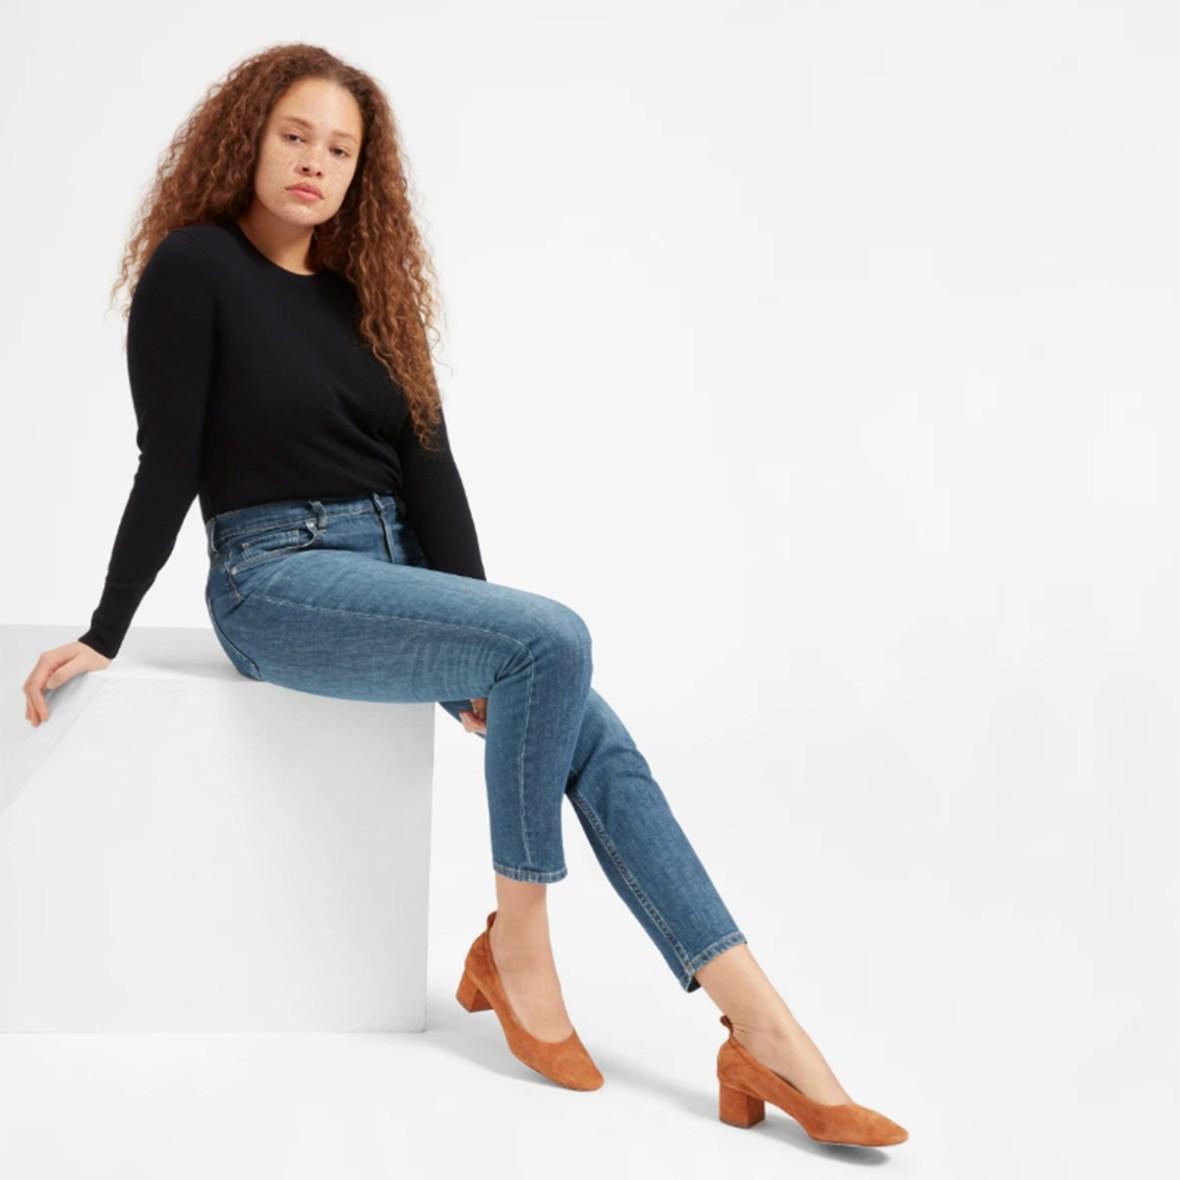 everlane-j-law-jeans